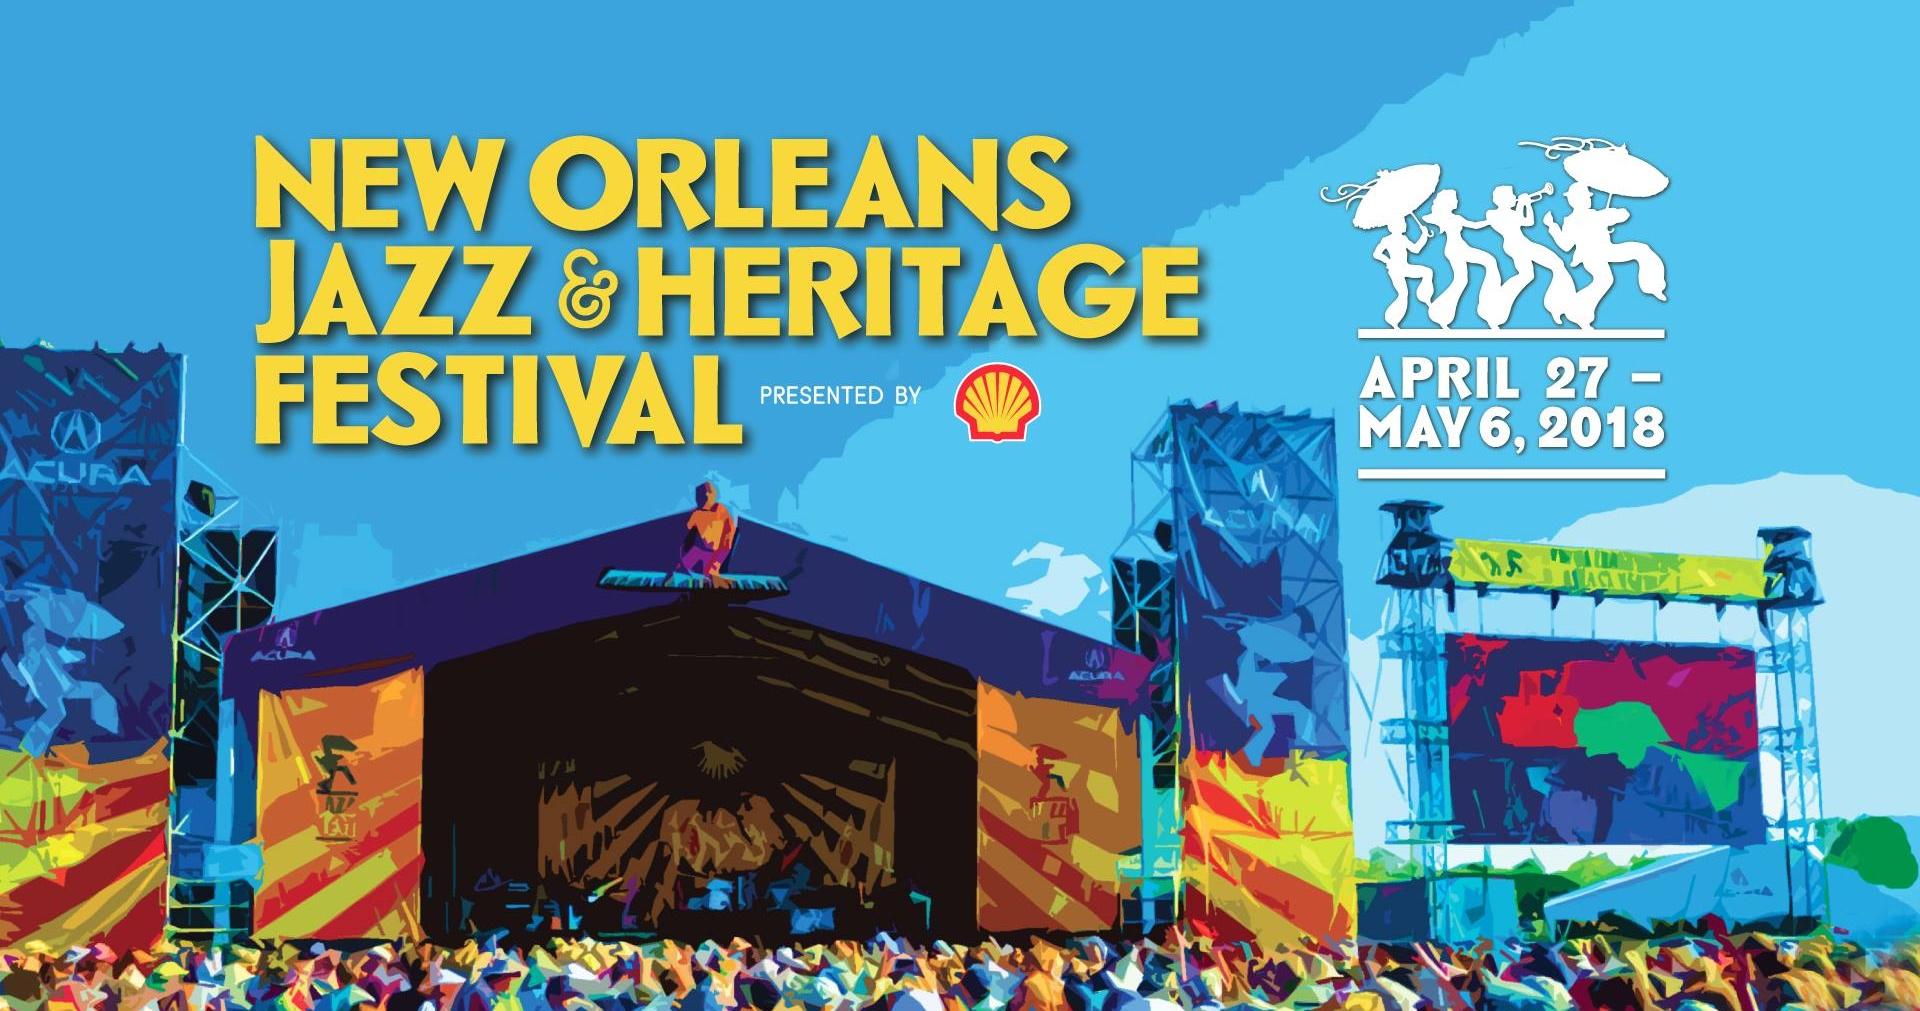 New Orleans Jazz & Heritage Festival Announces 2018 Lineup